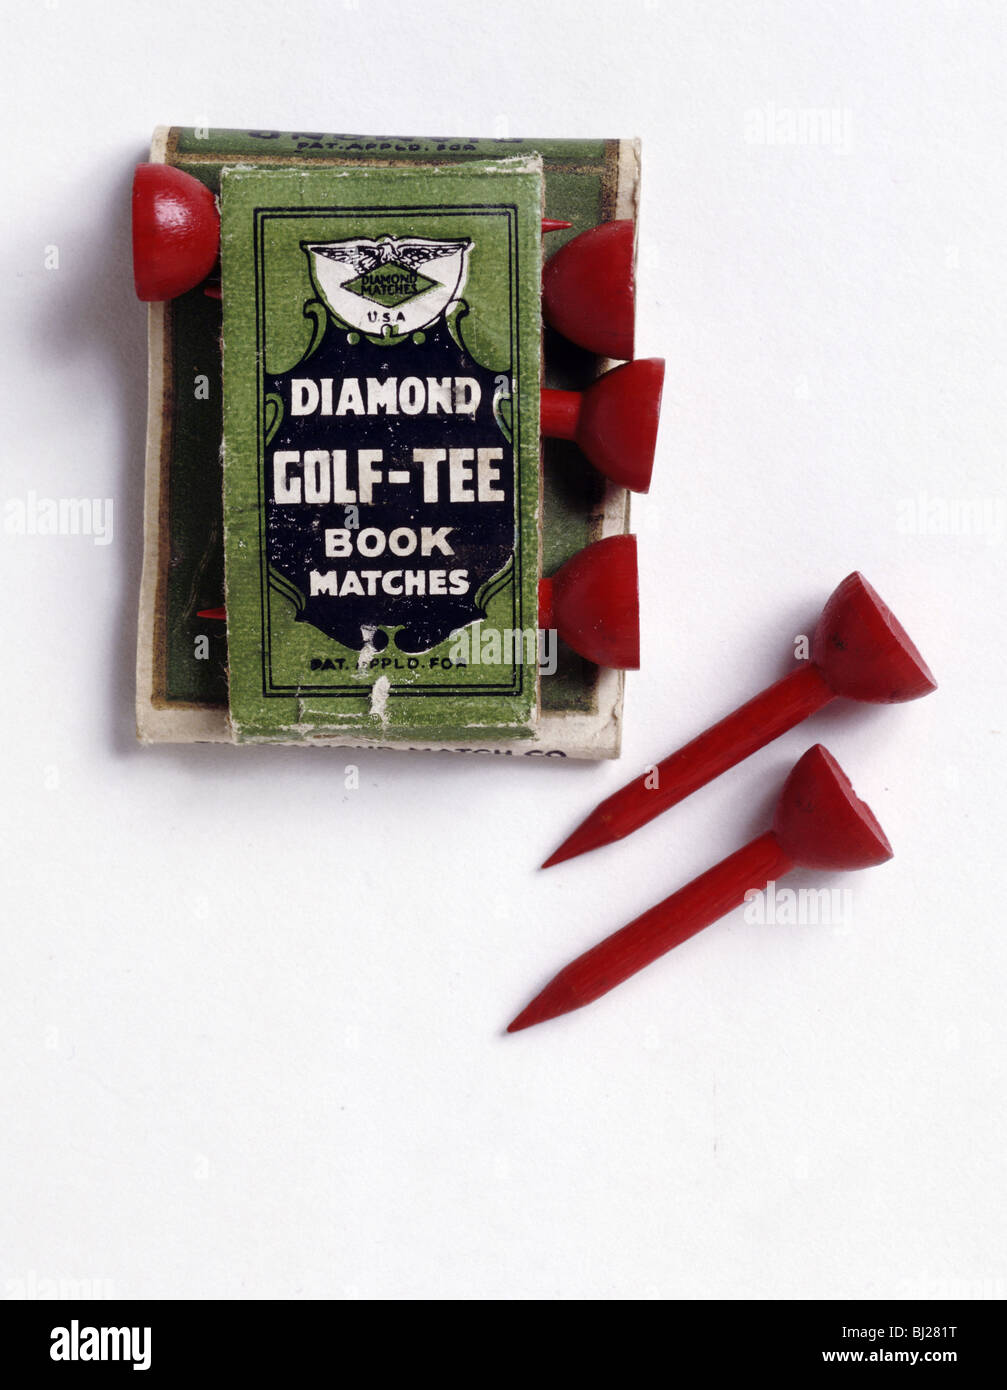 Diamond Golf Tee book of matches, c1900. - Stock Image